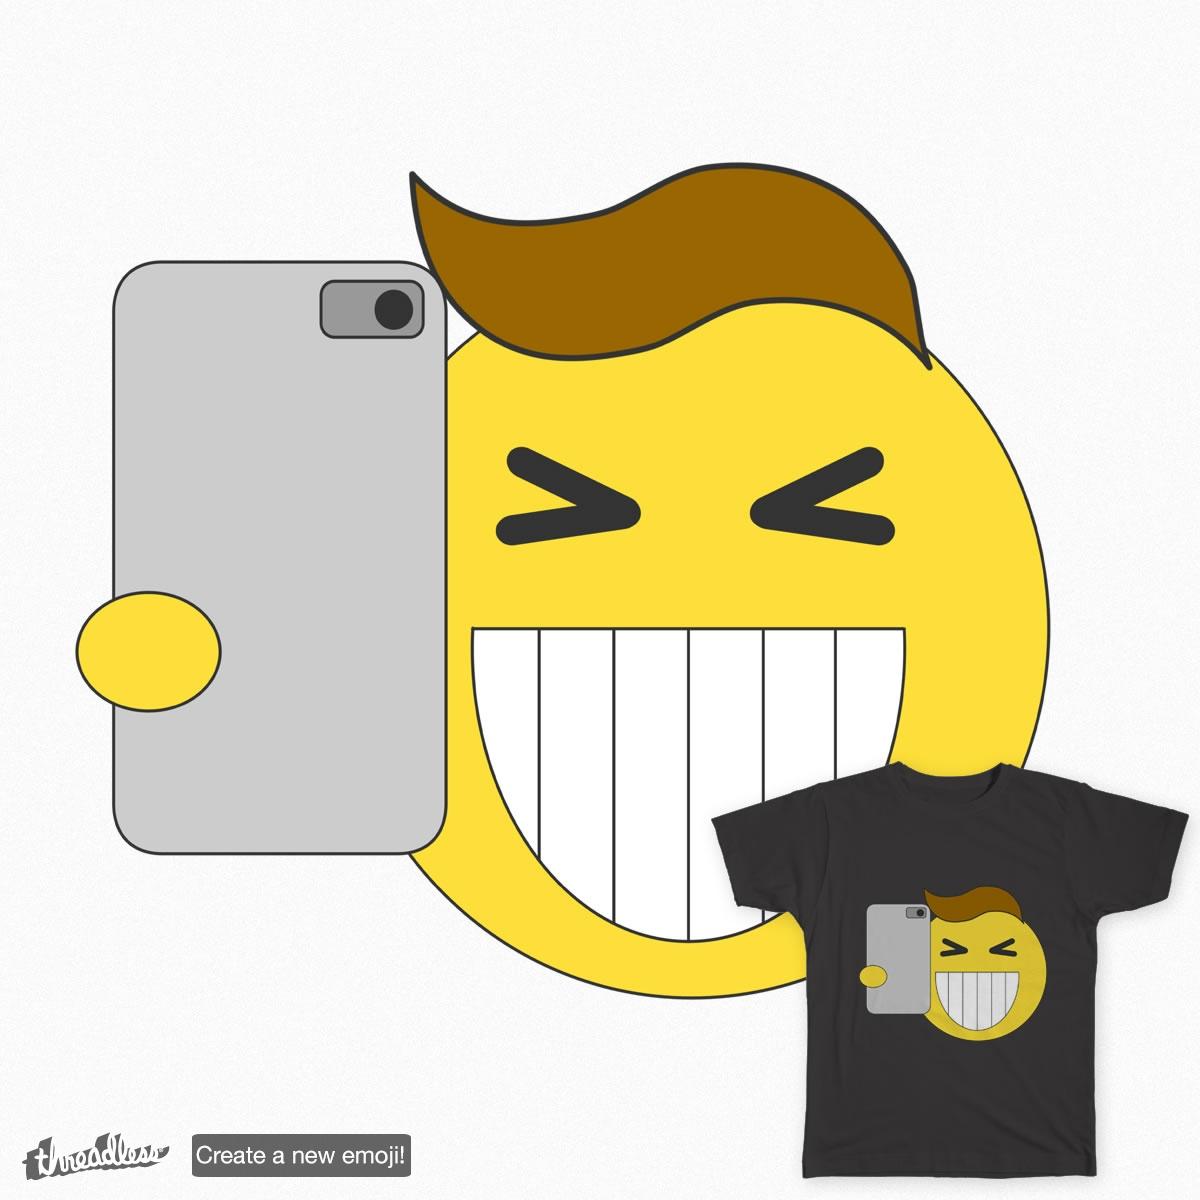 Selfie by siyi on Threadless